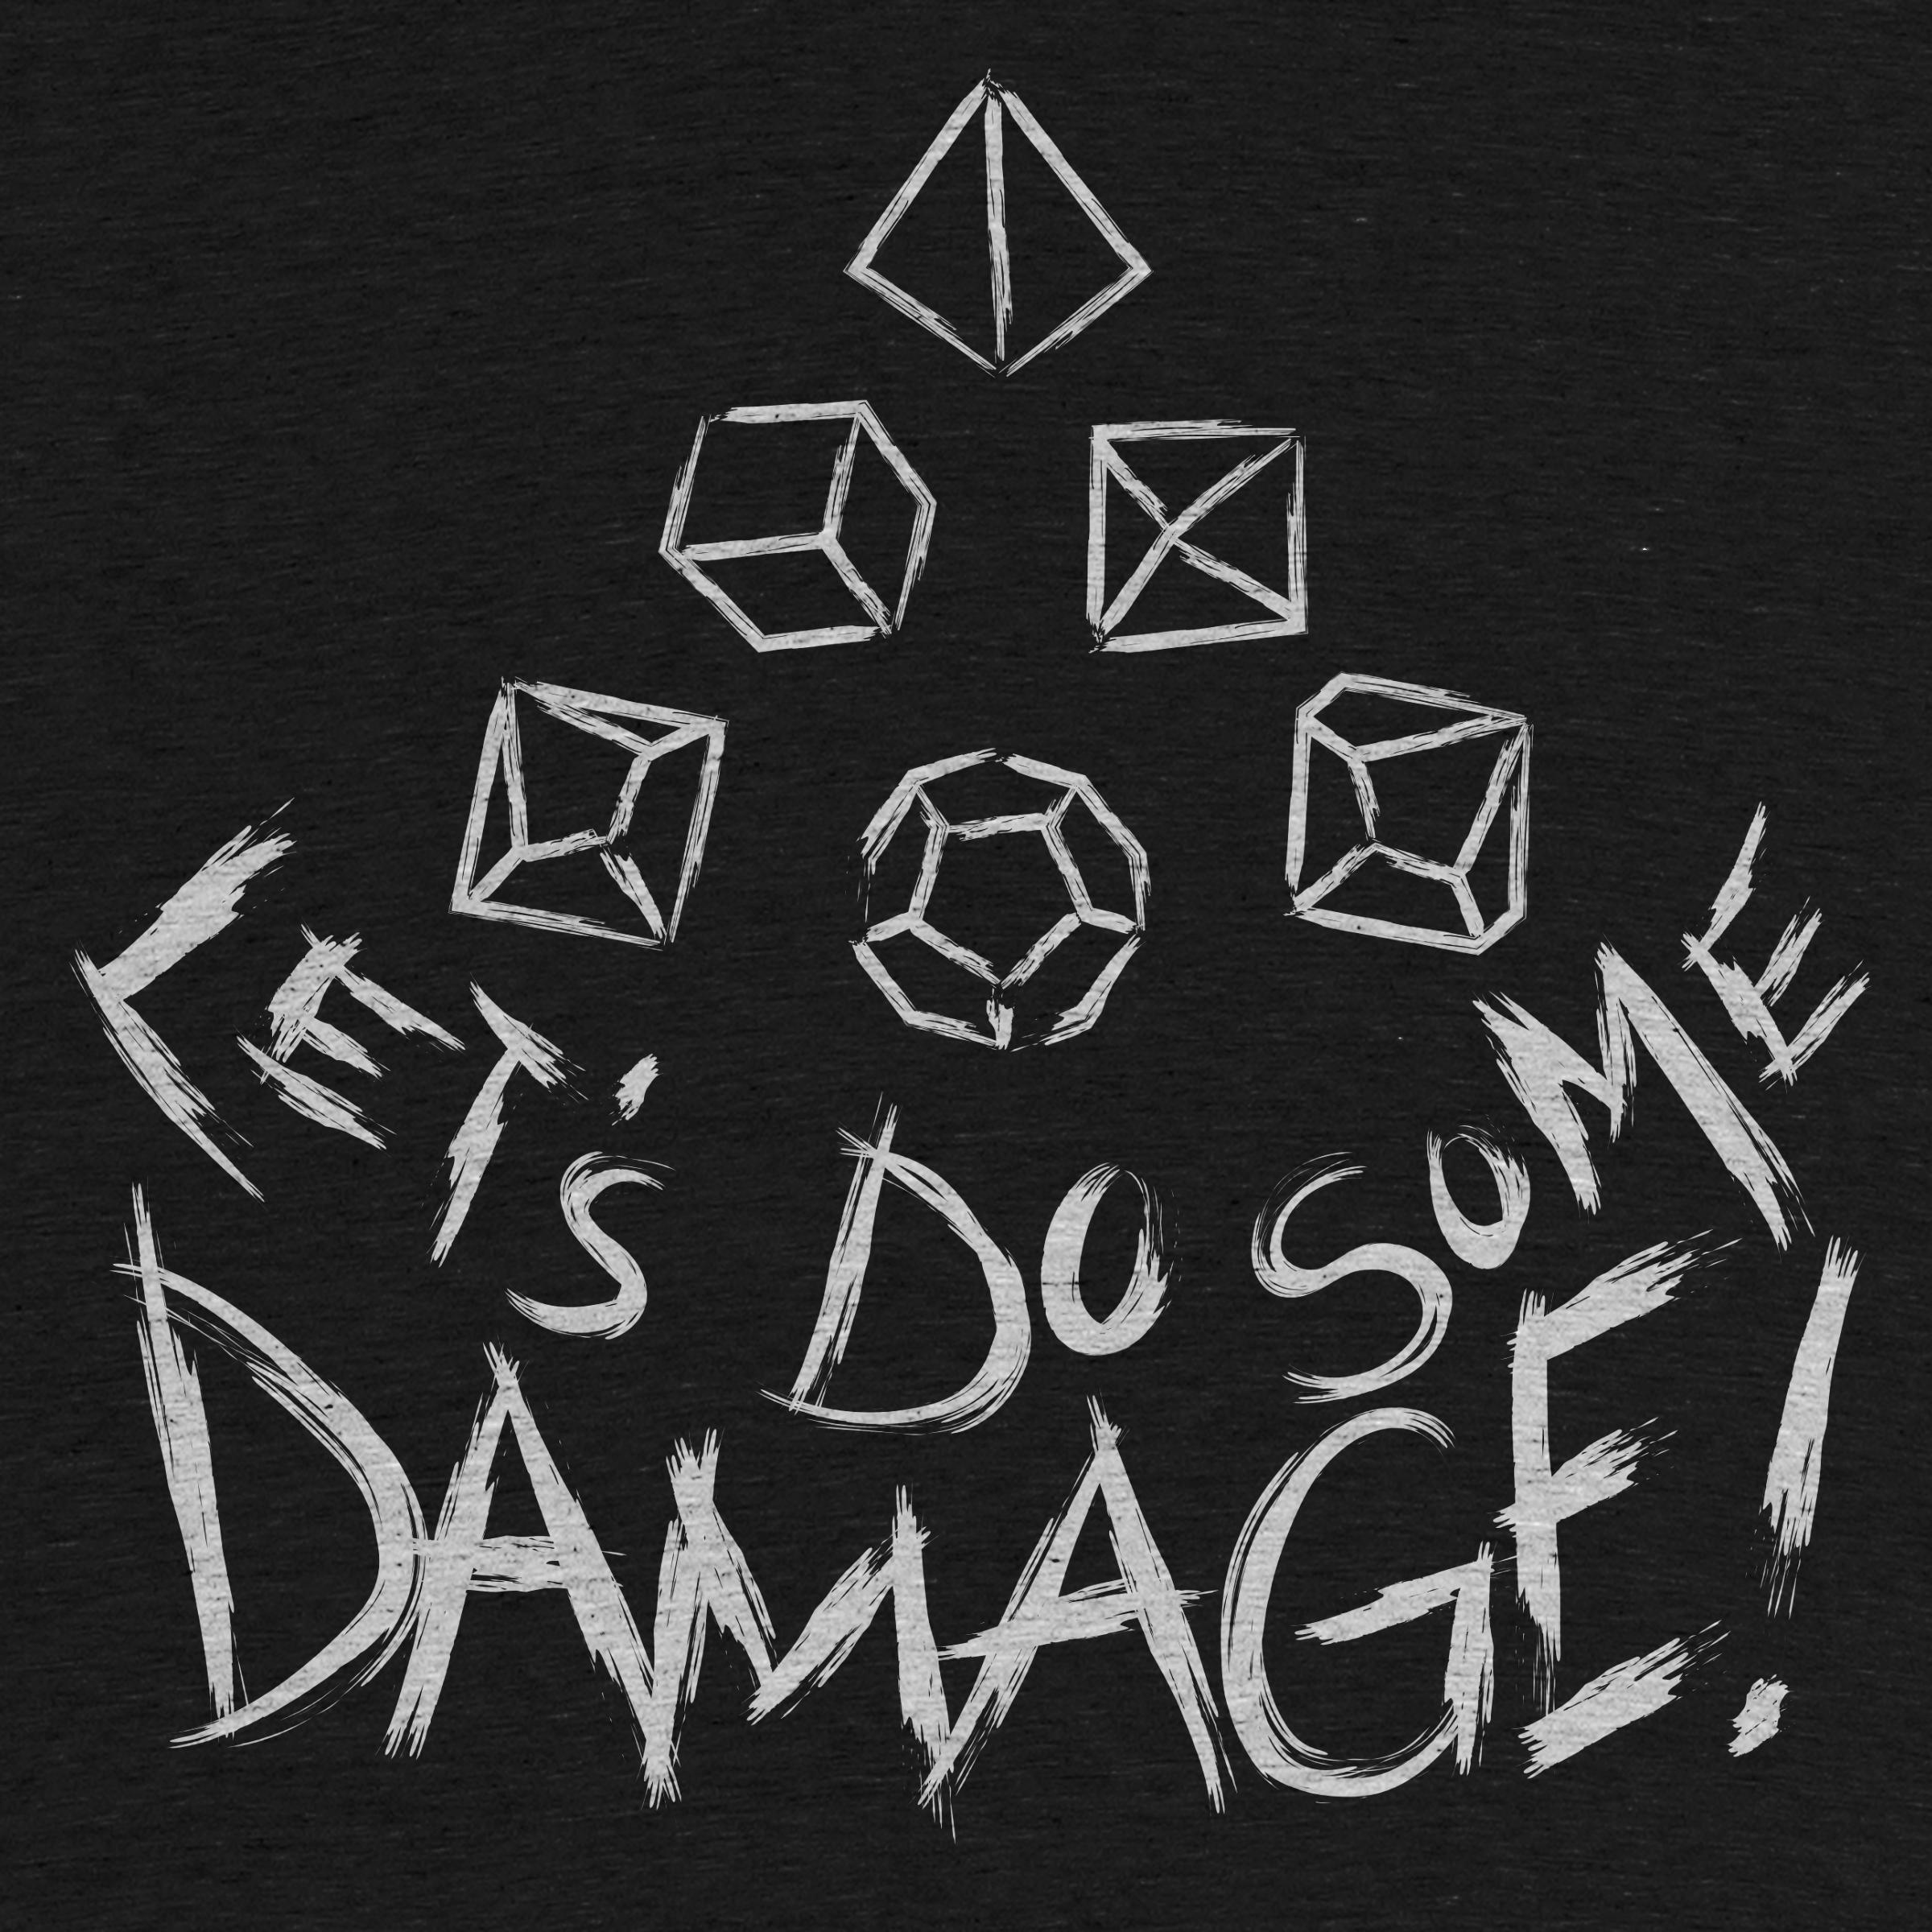 Let's Do Some Damage!